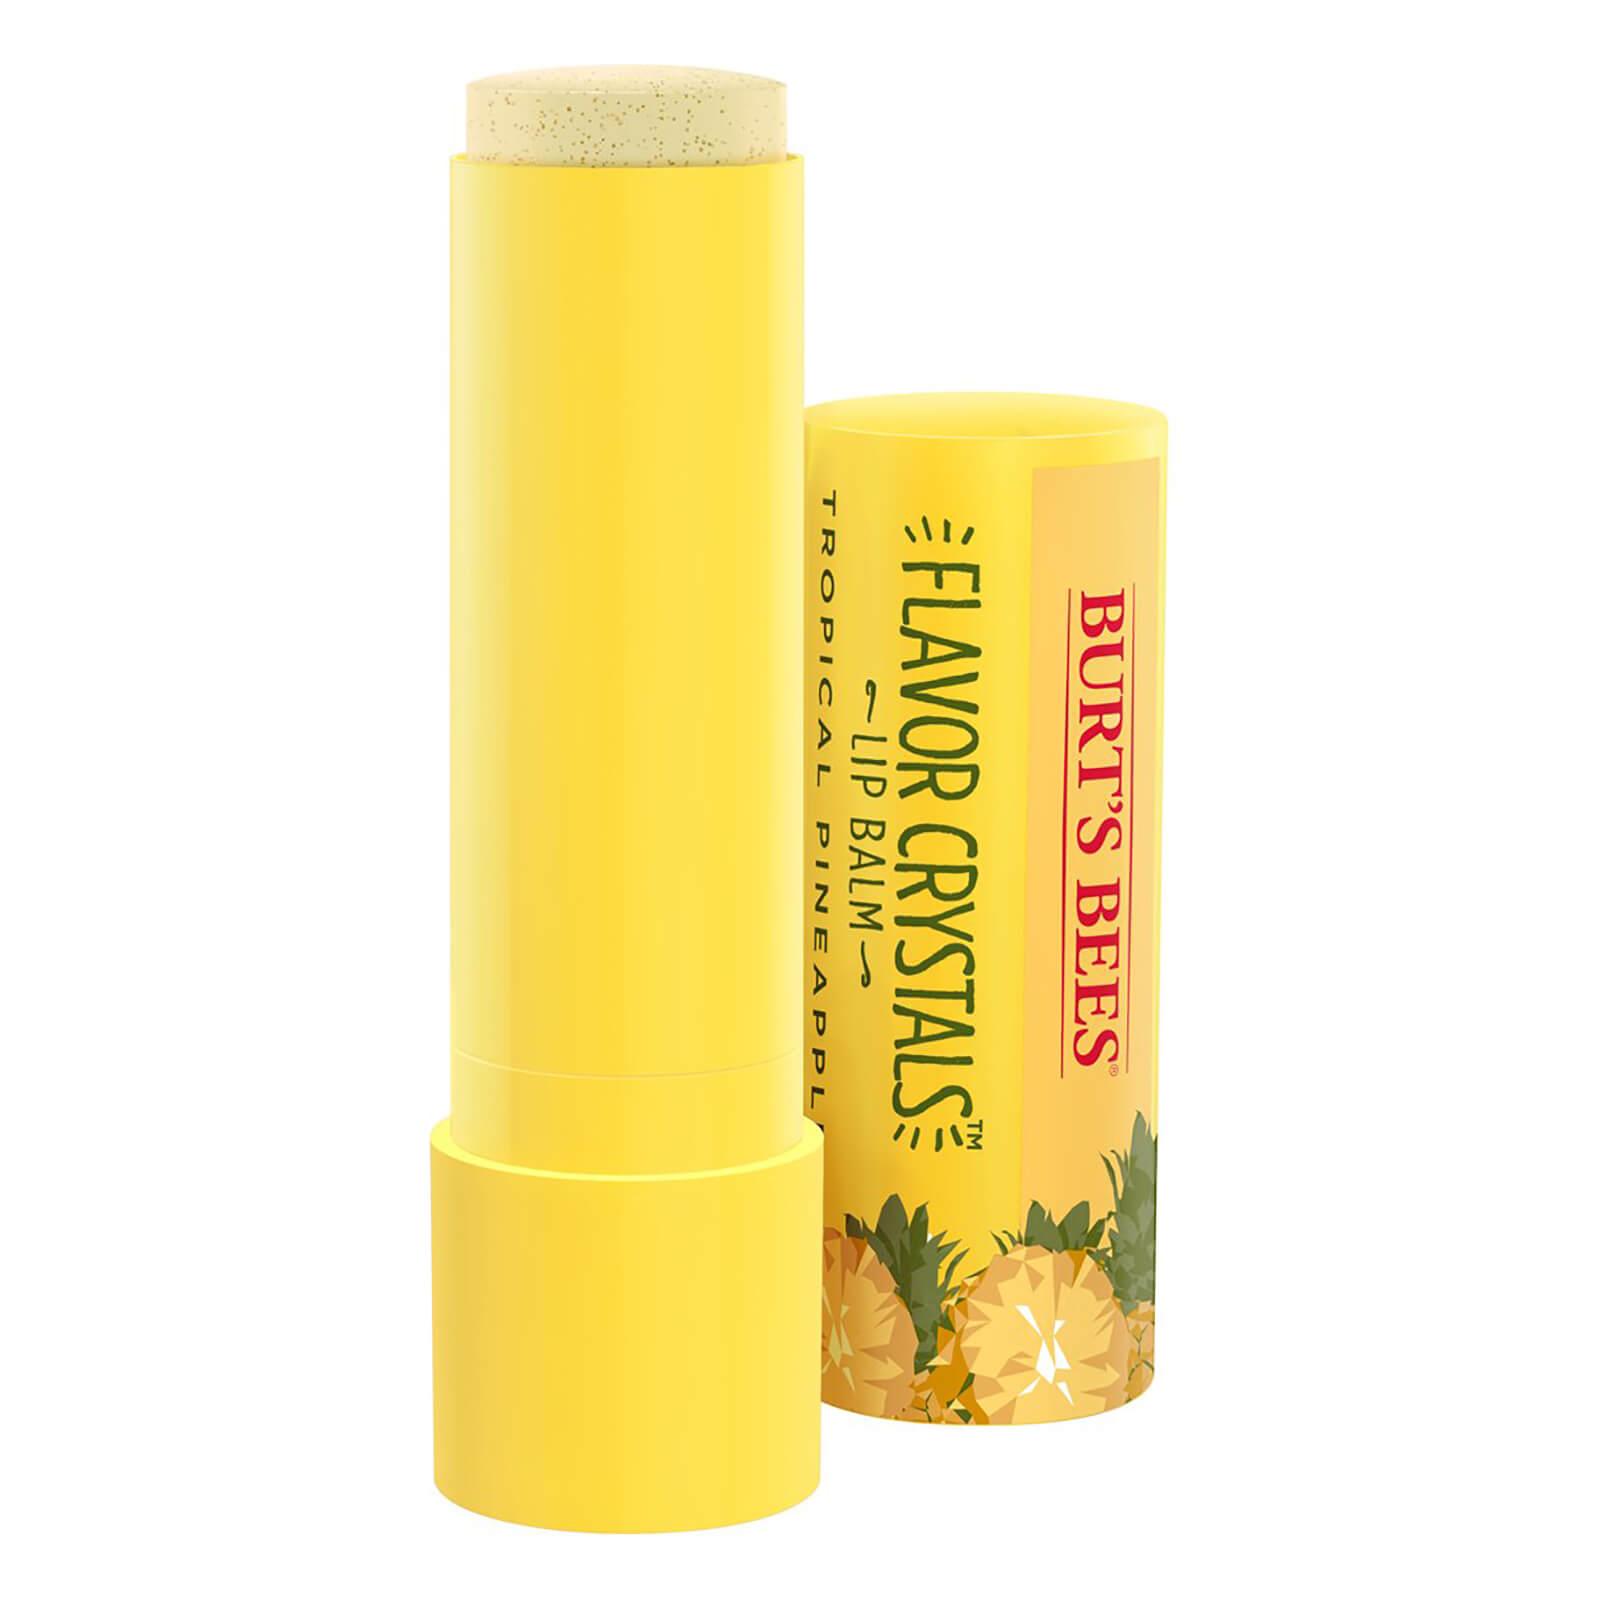 Burts Bees Flavour Crystals 100% Natural Moisturising Lip Balm - Tropical Pineapple 4.53g